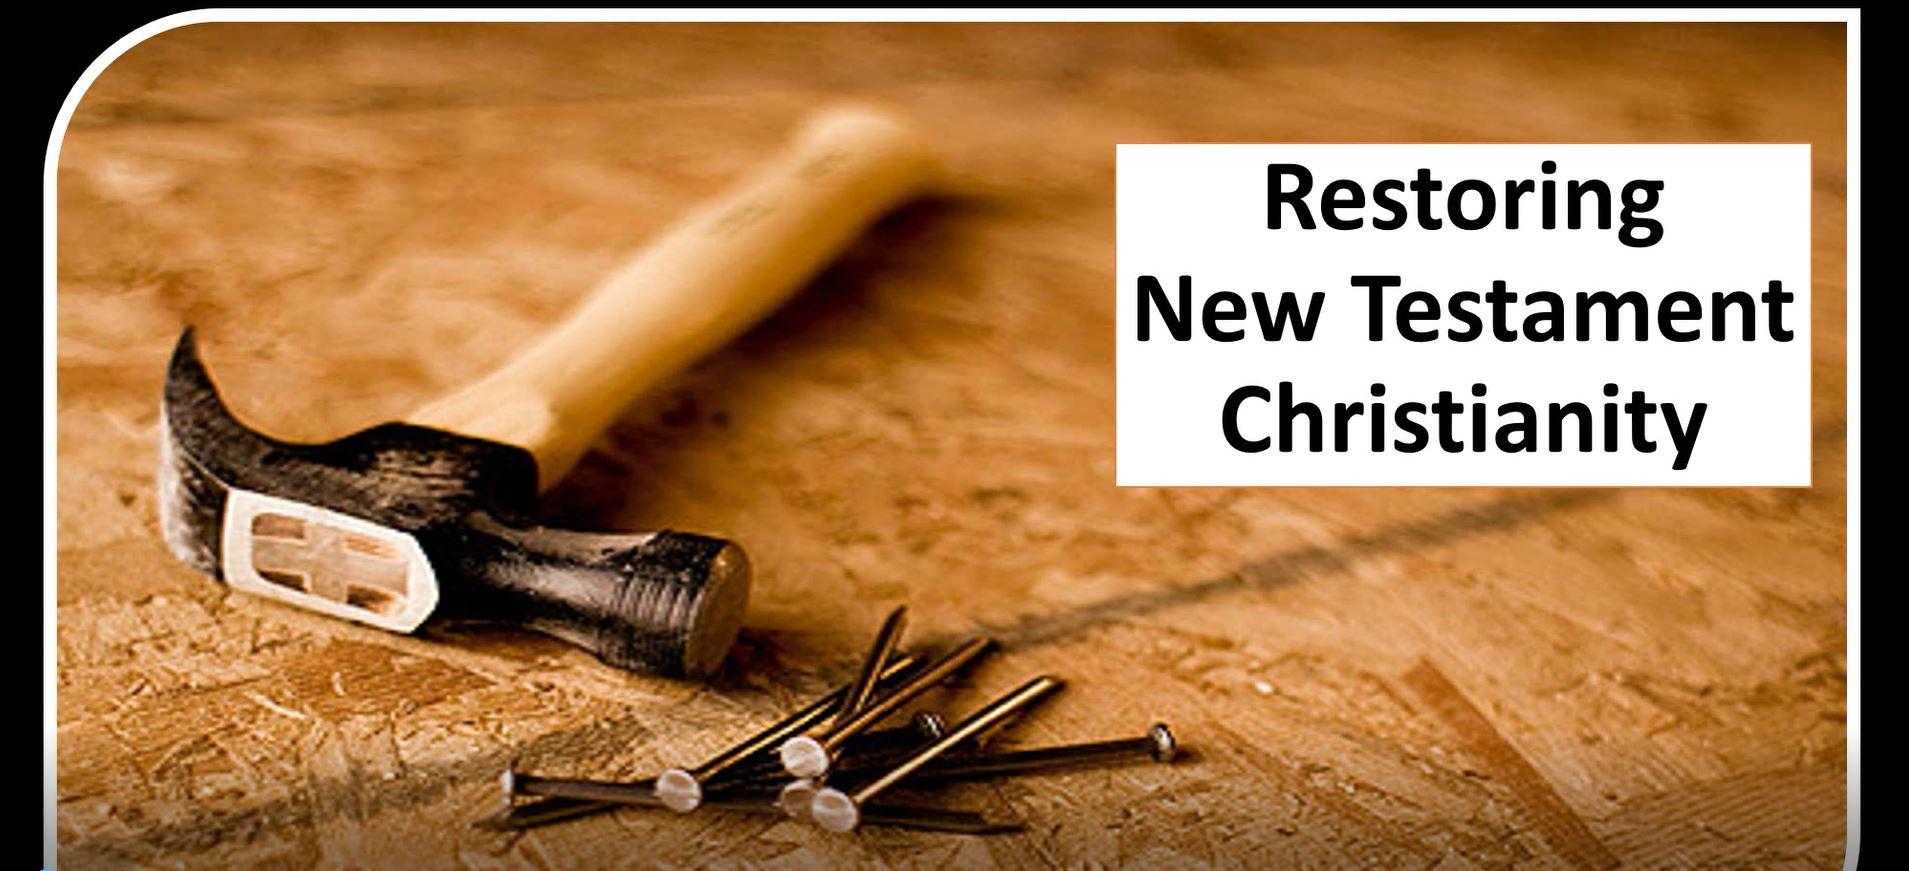 Restoring New Testament Christianity